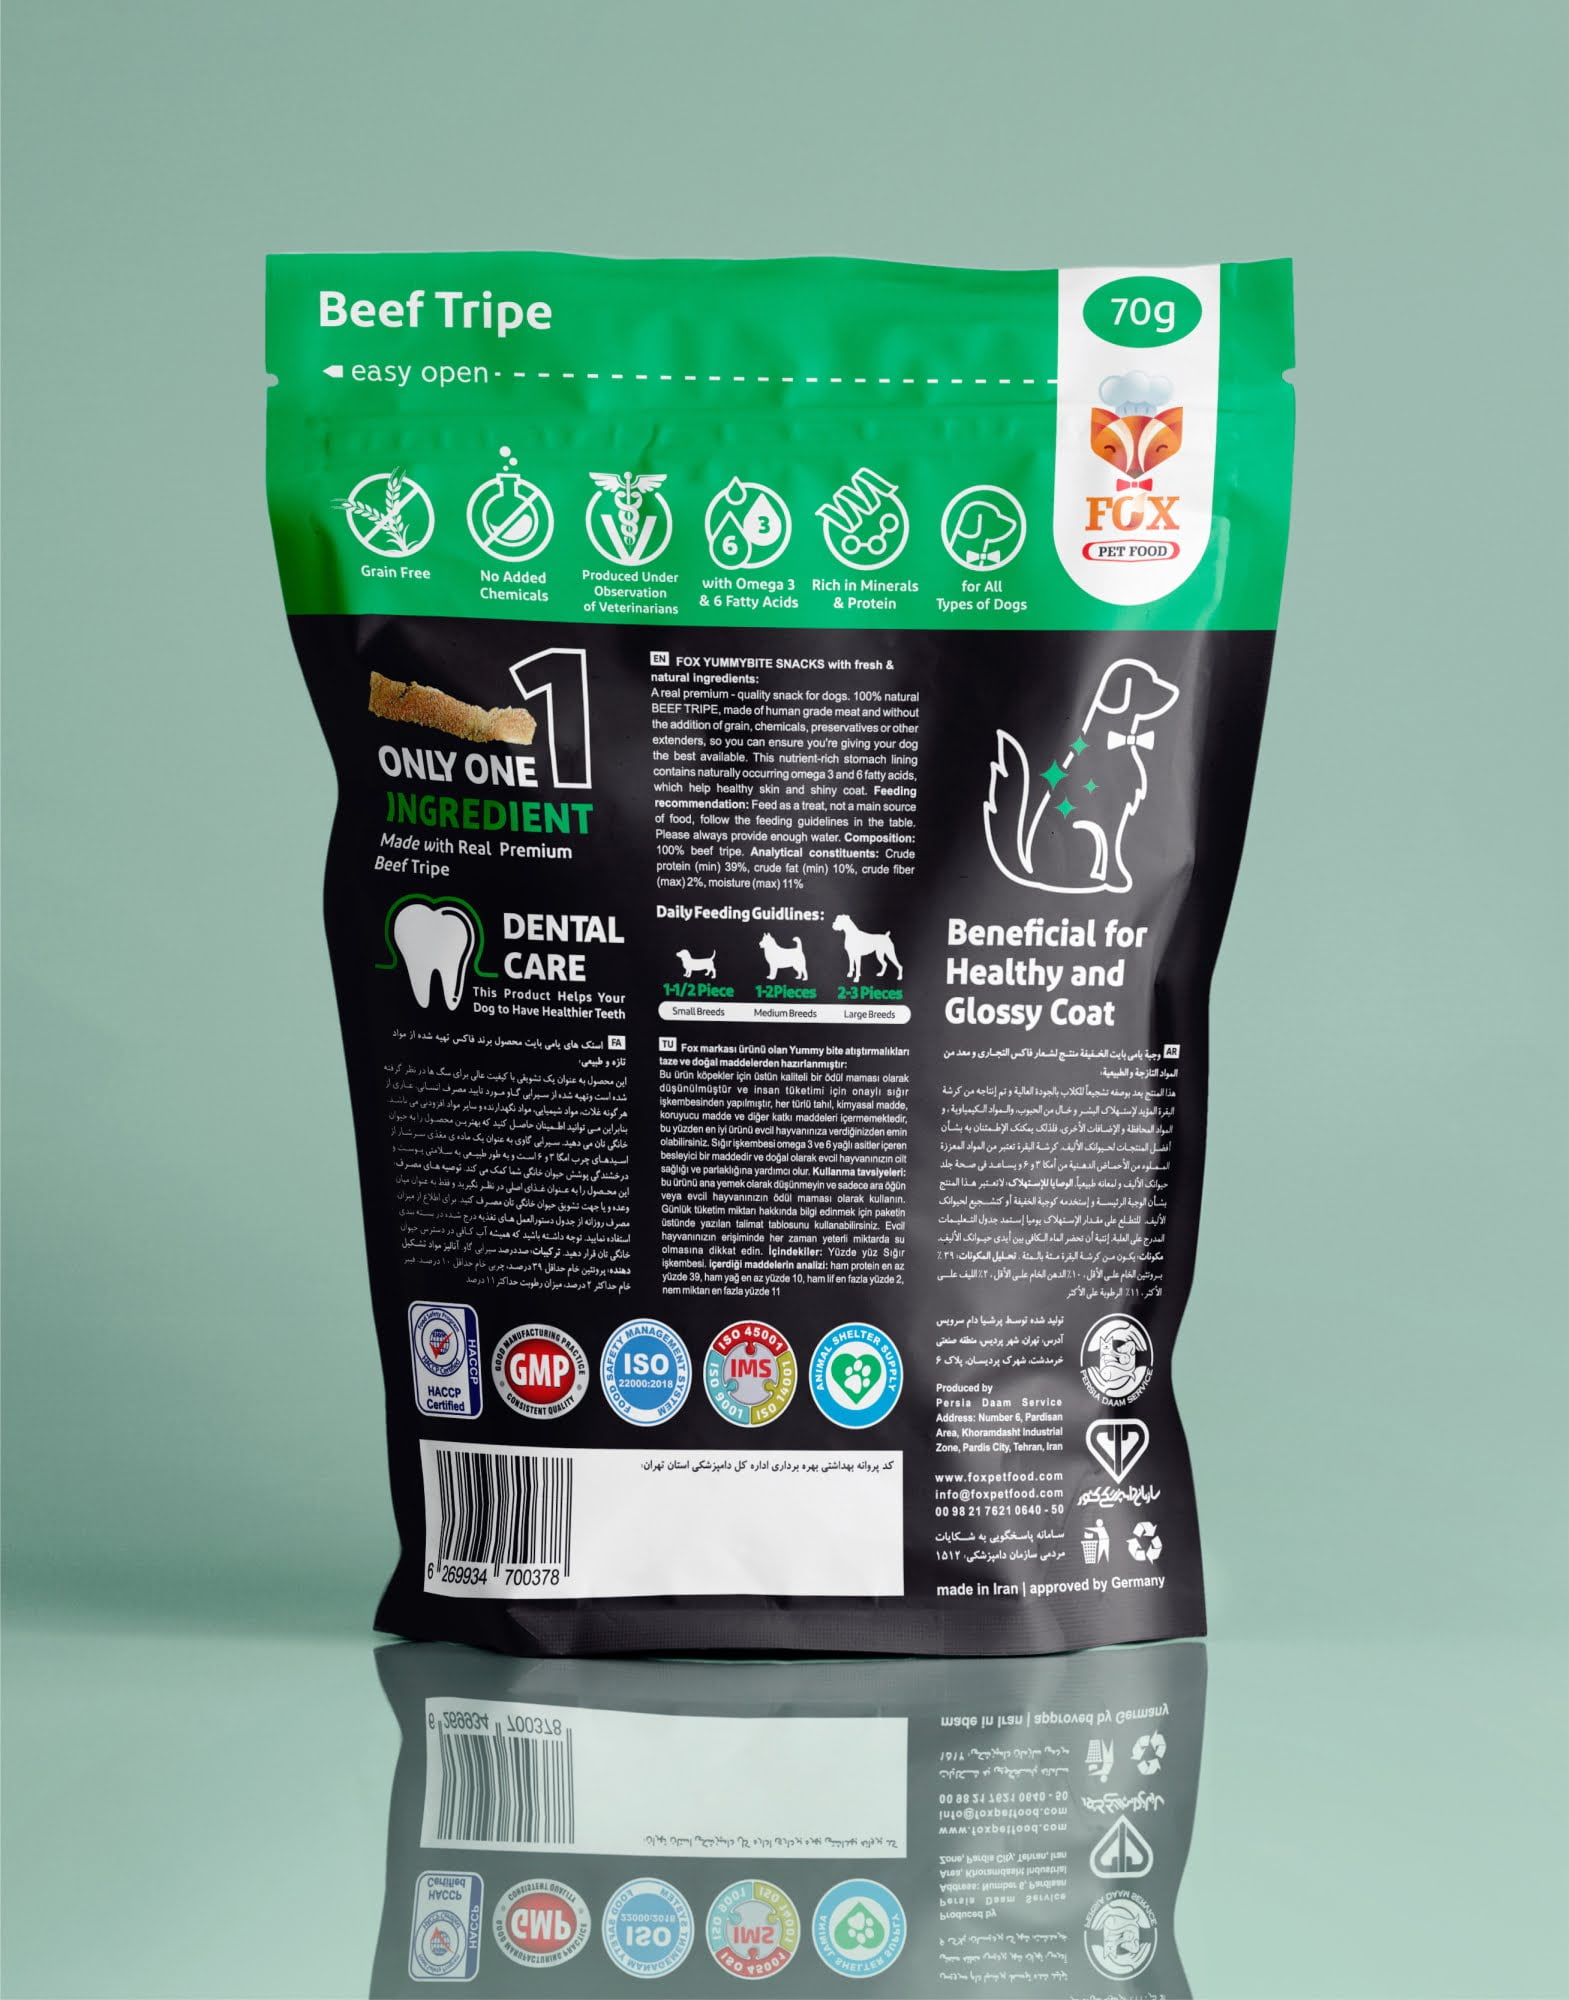 yummybite-beef tripe-70g-back